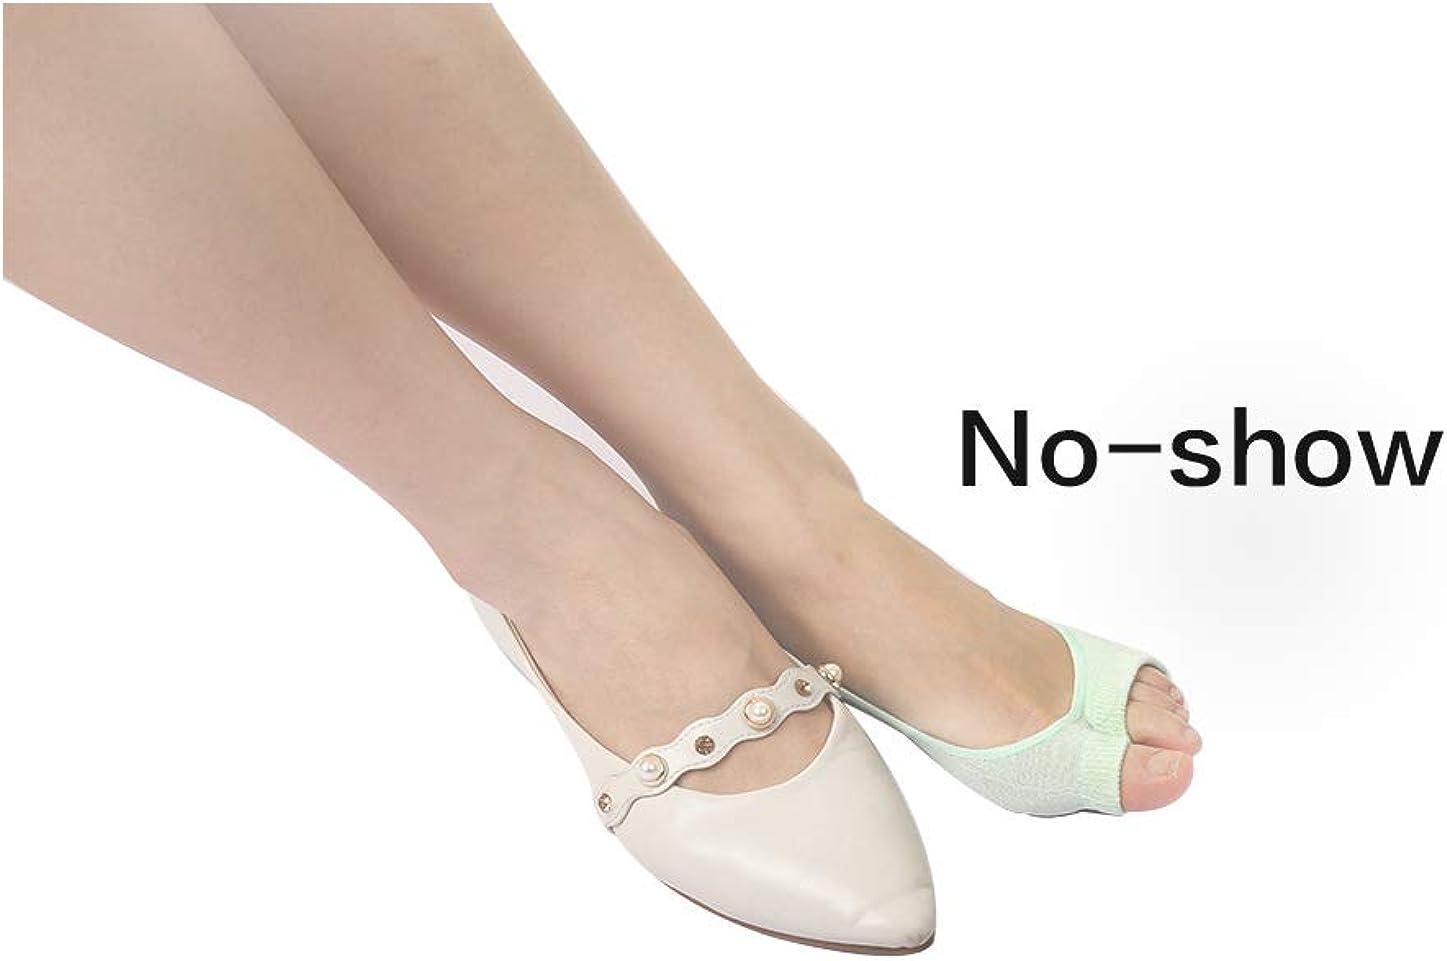 uxcell Women Cotton Socks Low Cut Non Slip Open Toe No Show Sock 6 Pairs